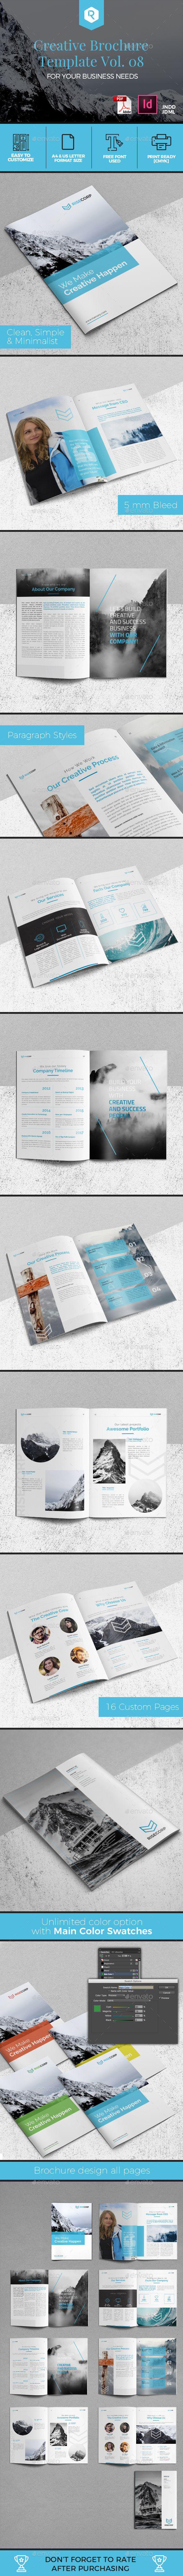 Creative Brochure Template Vol. 08 - Corporate Brochures